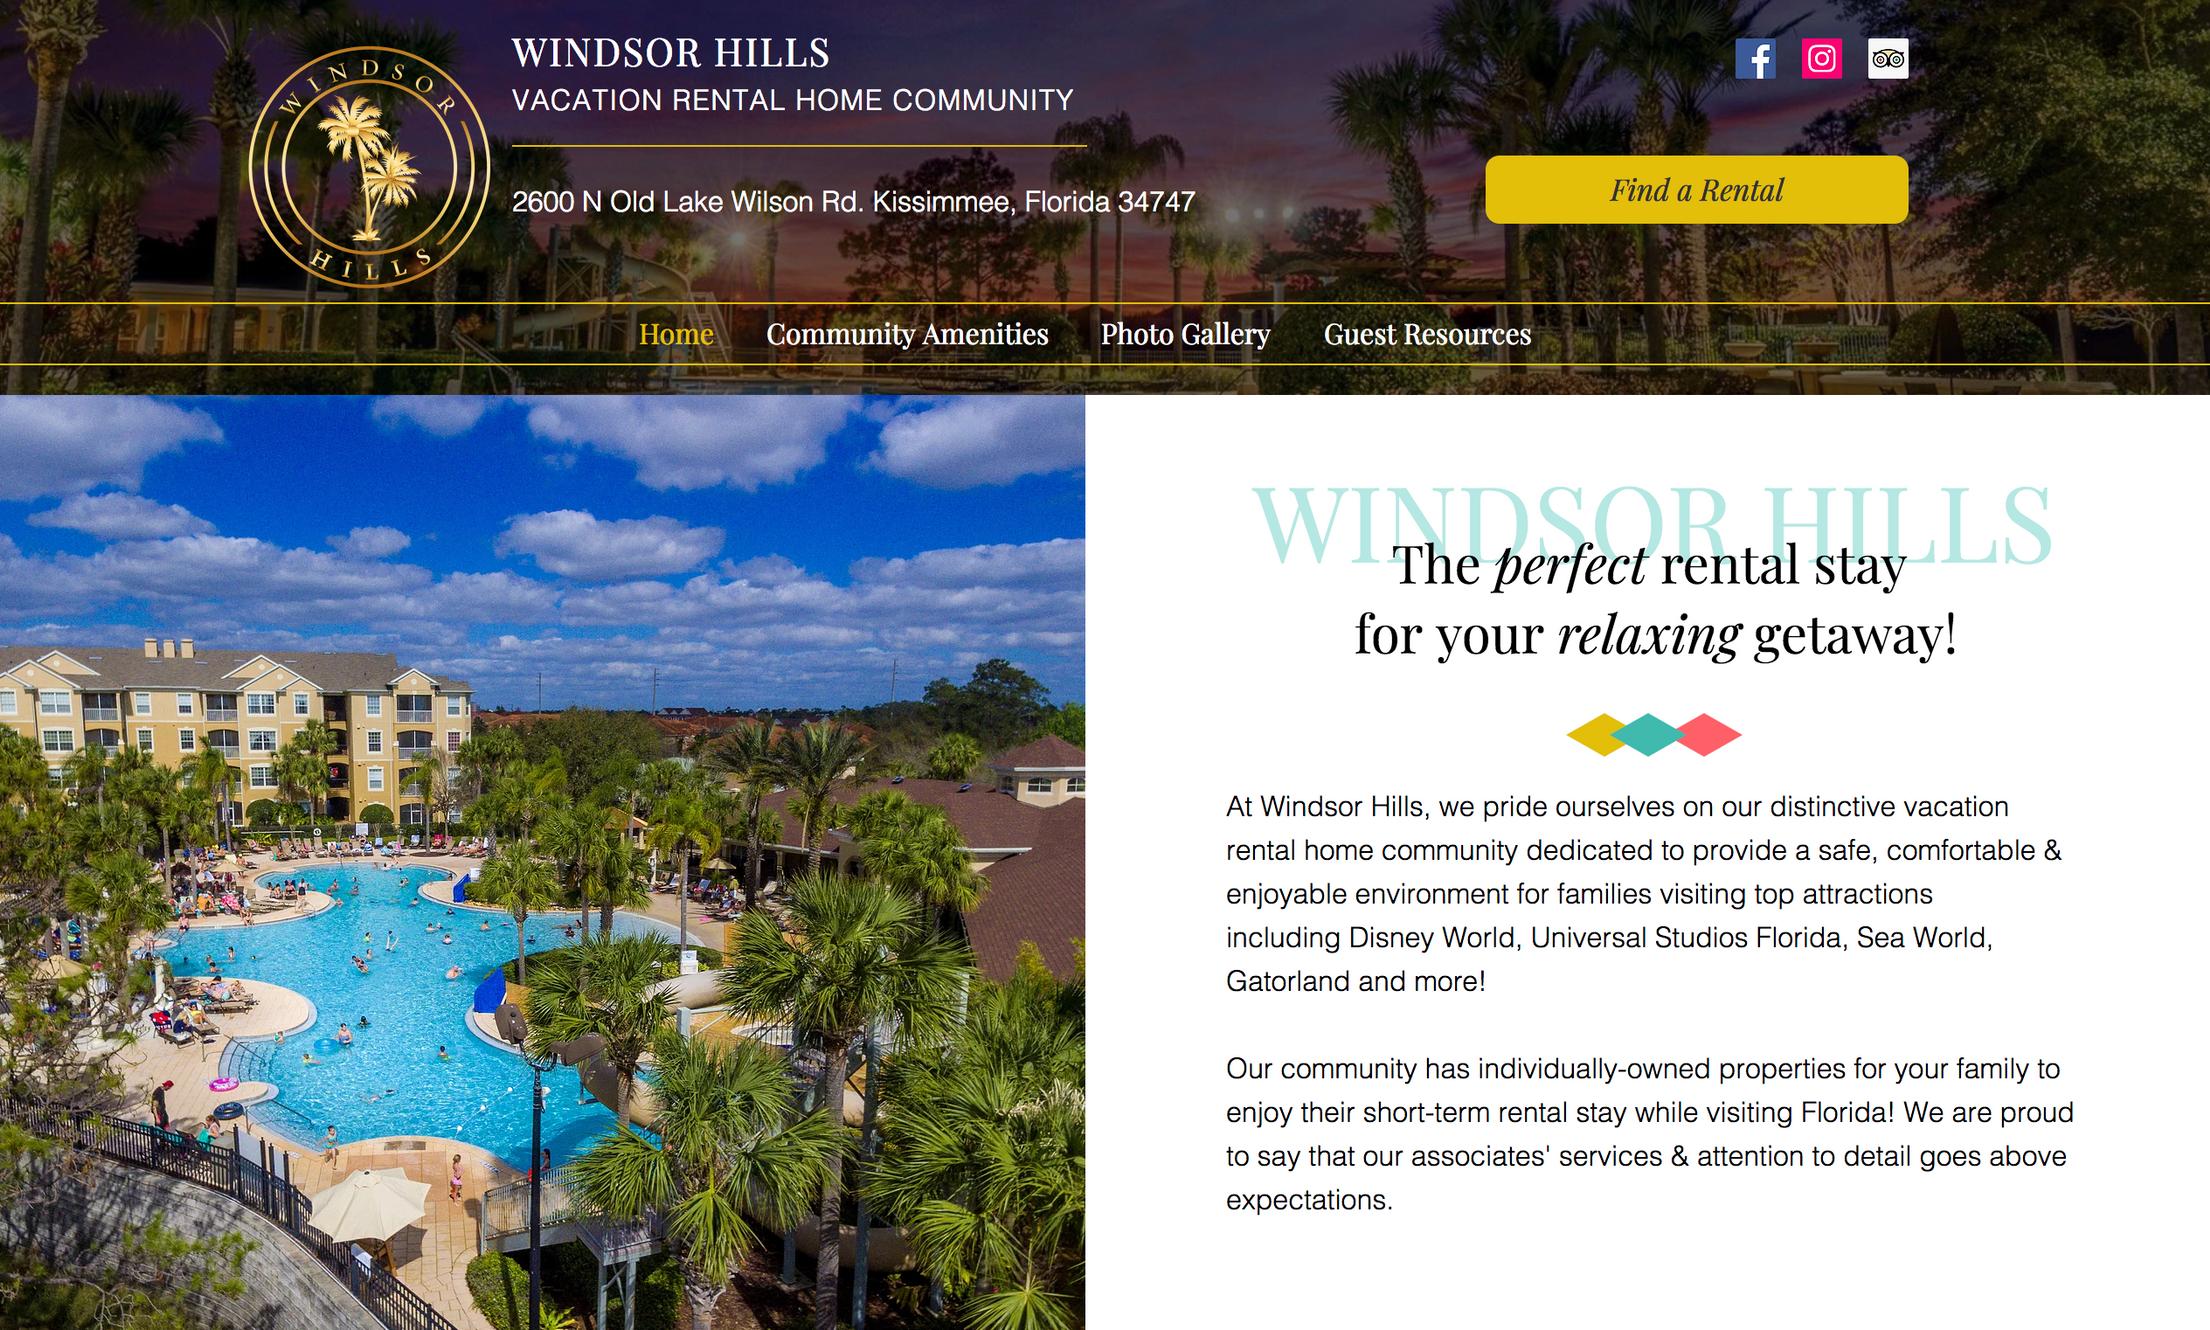 Vacation Rental Homes | Kissimmee, Florida | Windsor Hills